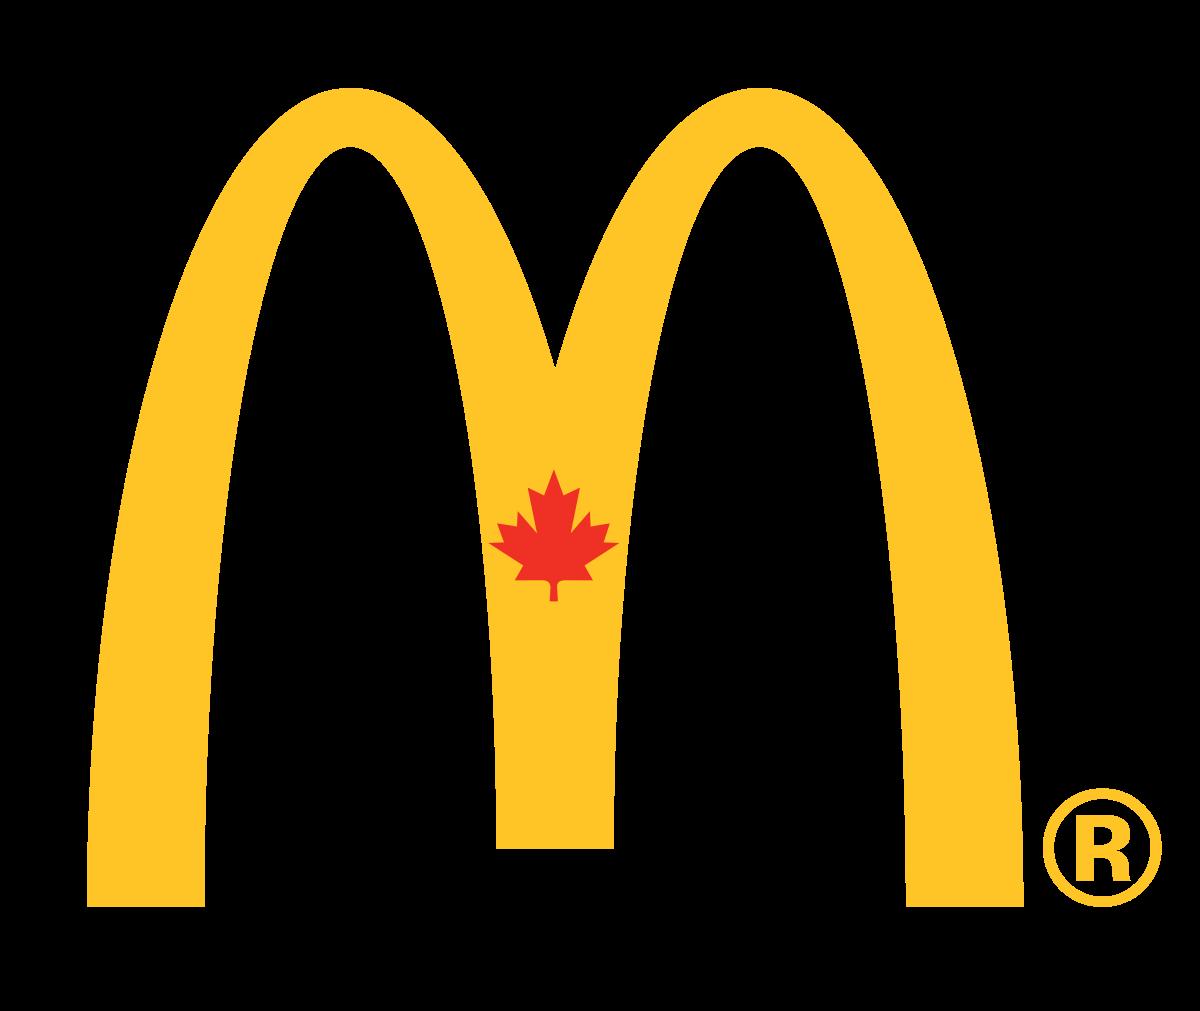 Les Restaurants McDonald's Guy Alain Inc.